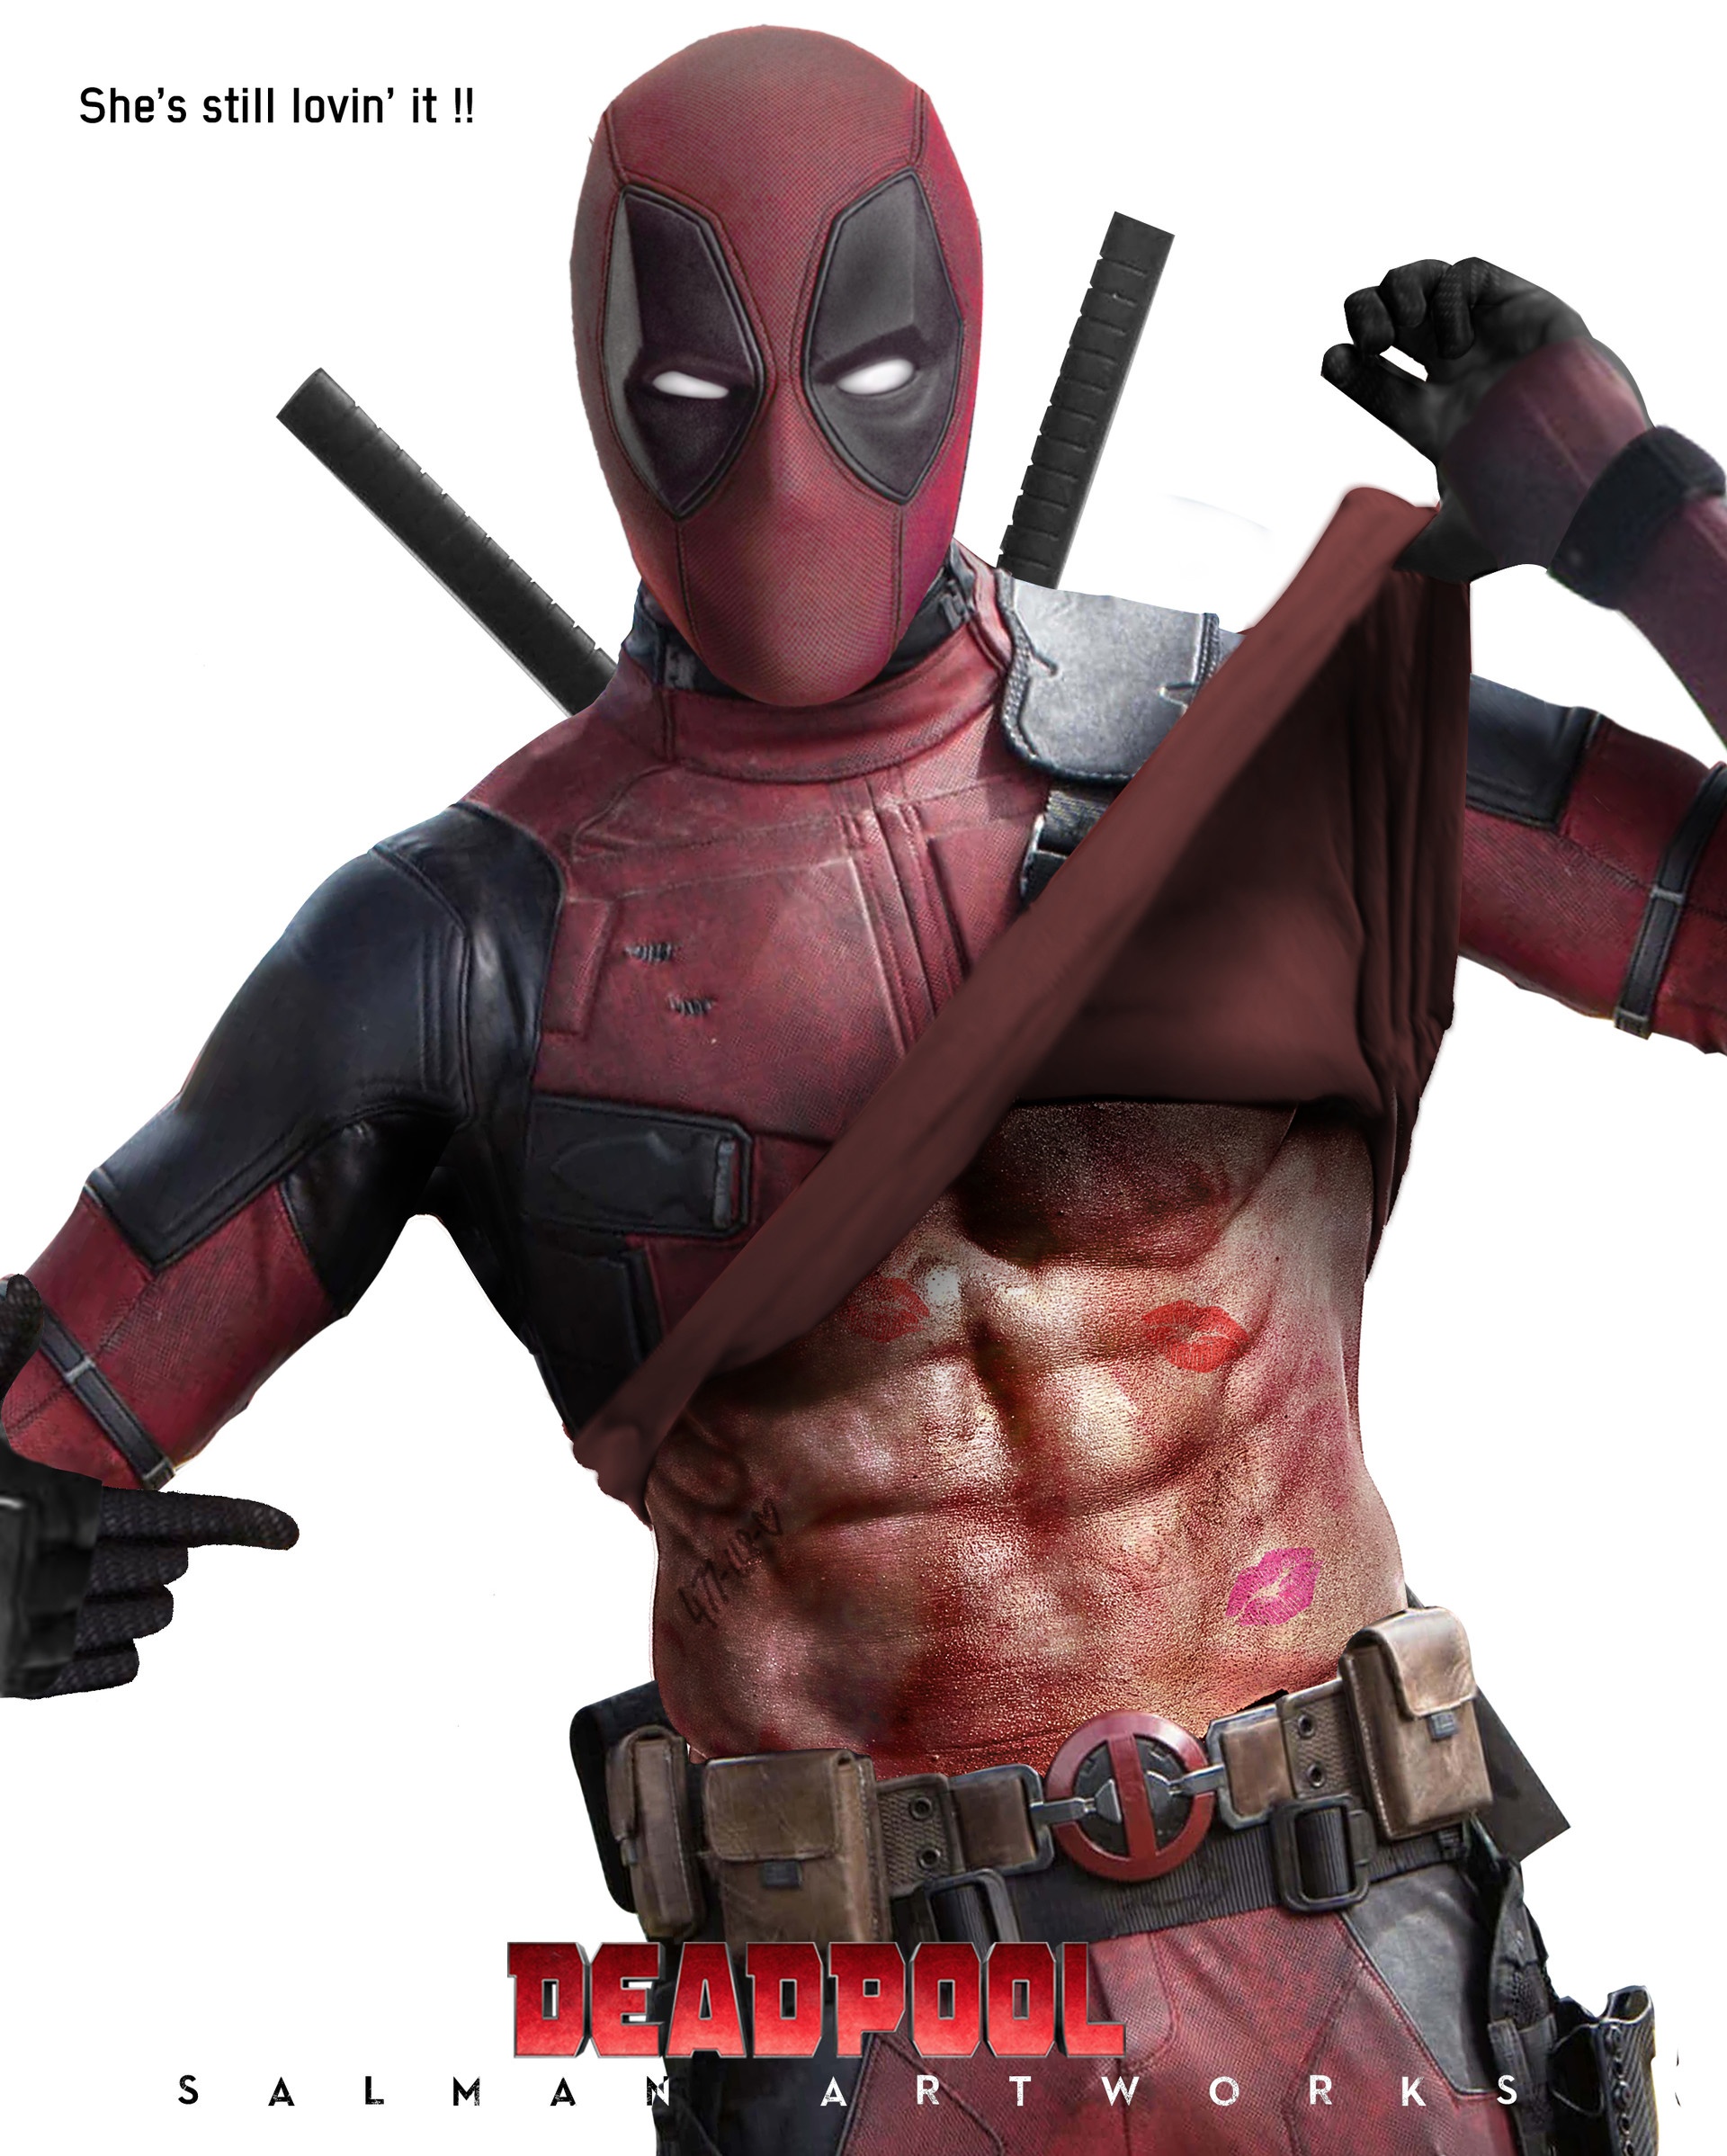 Deadpool 2 Meme Image 21